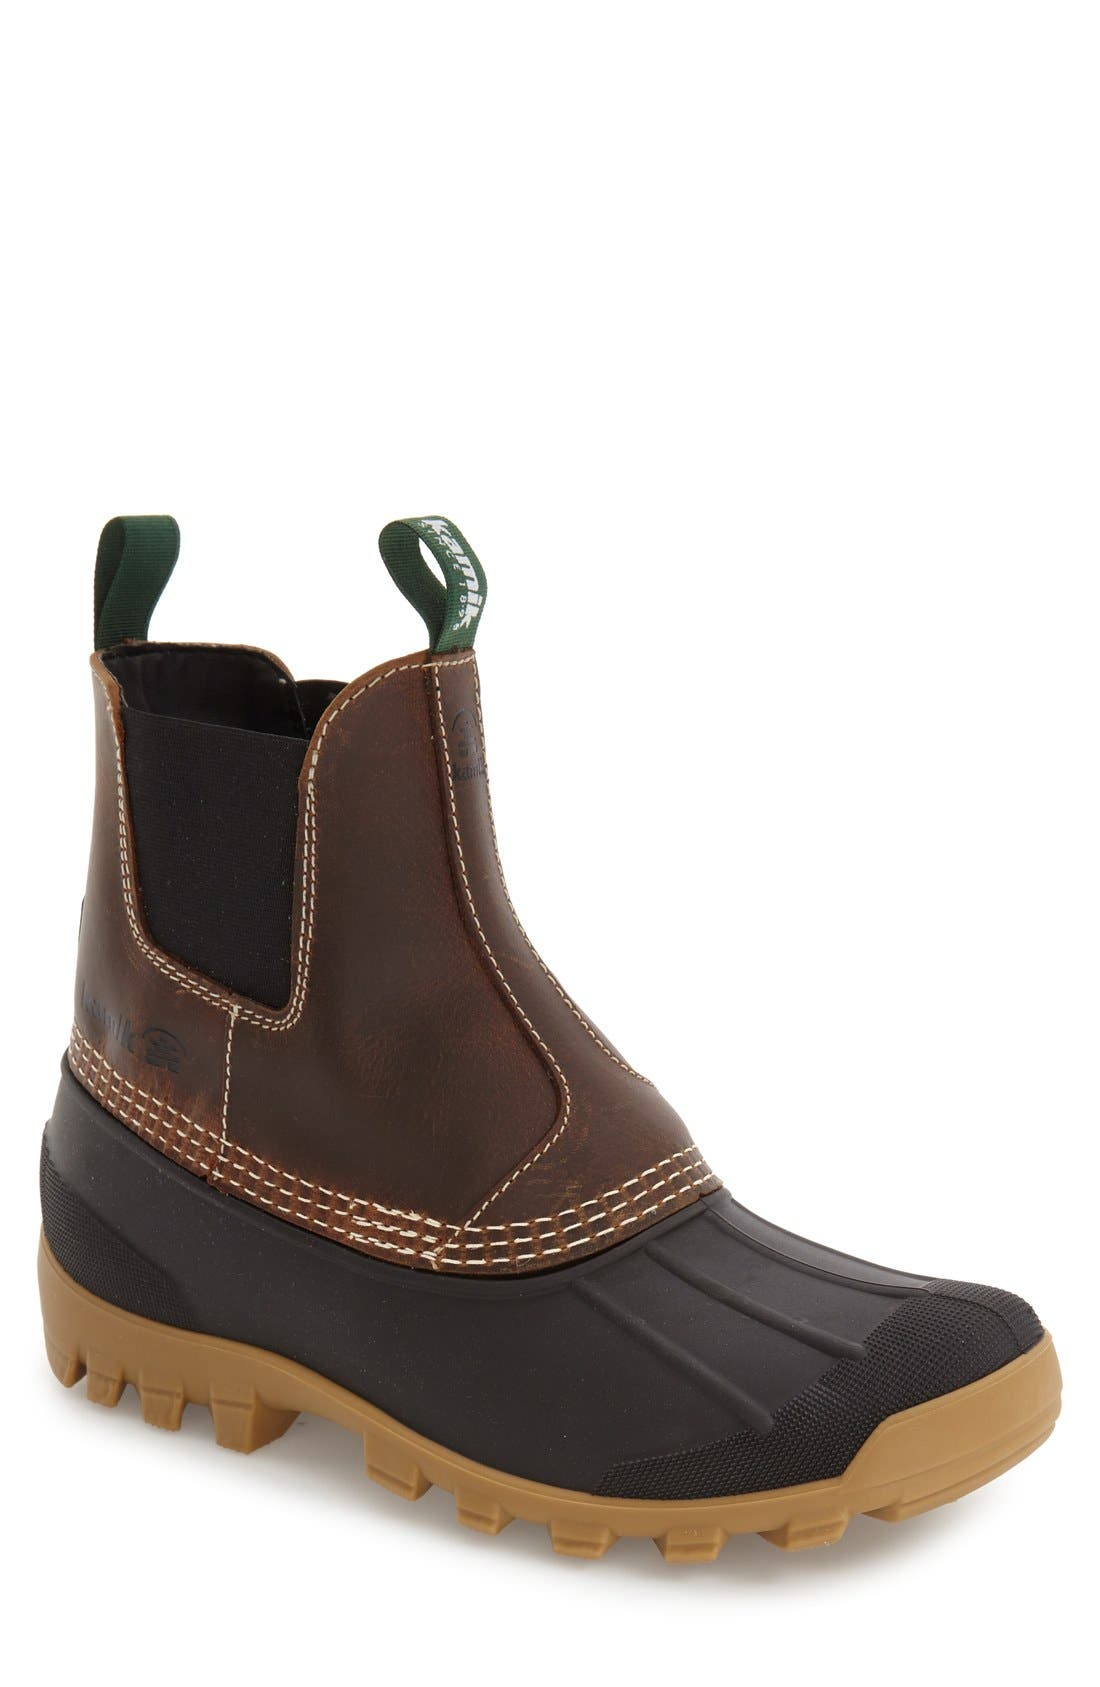 Yukon C Snow Boot,                             Main thumbnail 1, color,                             Dark Brown Leather